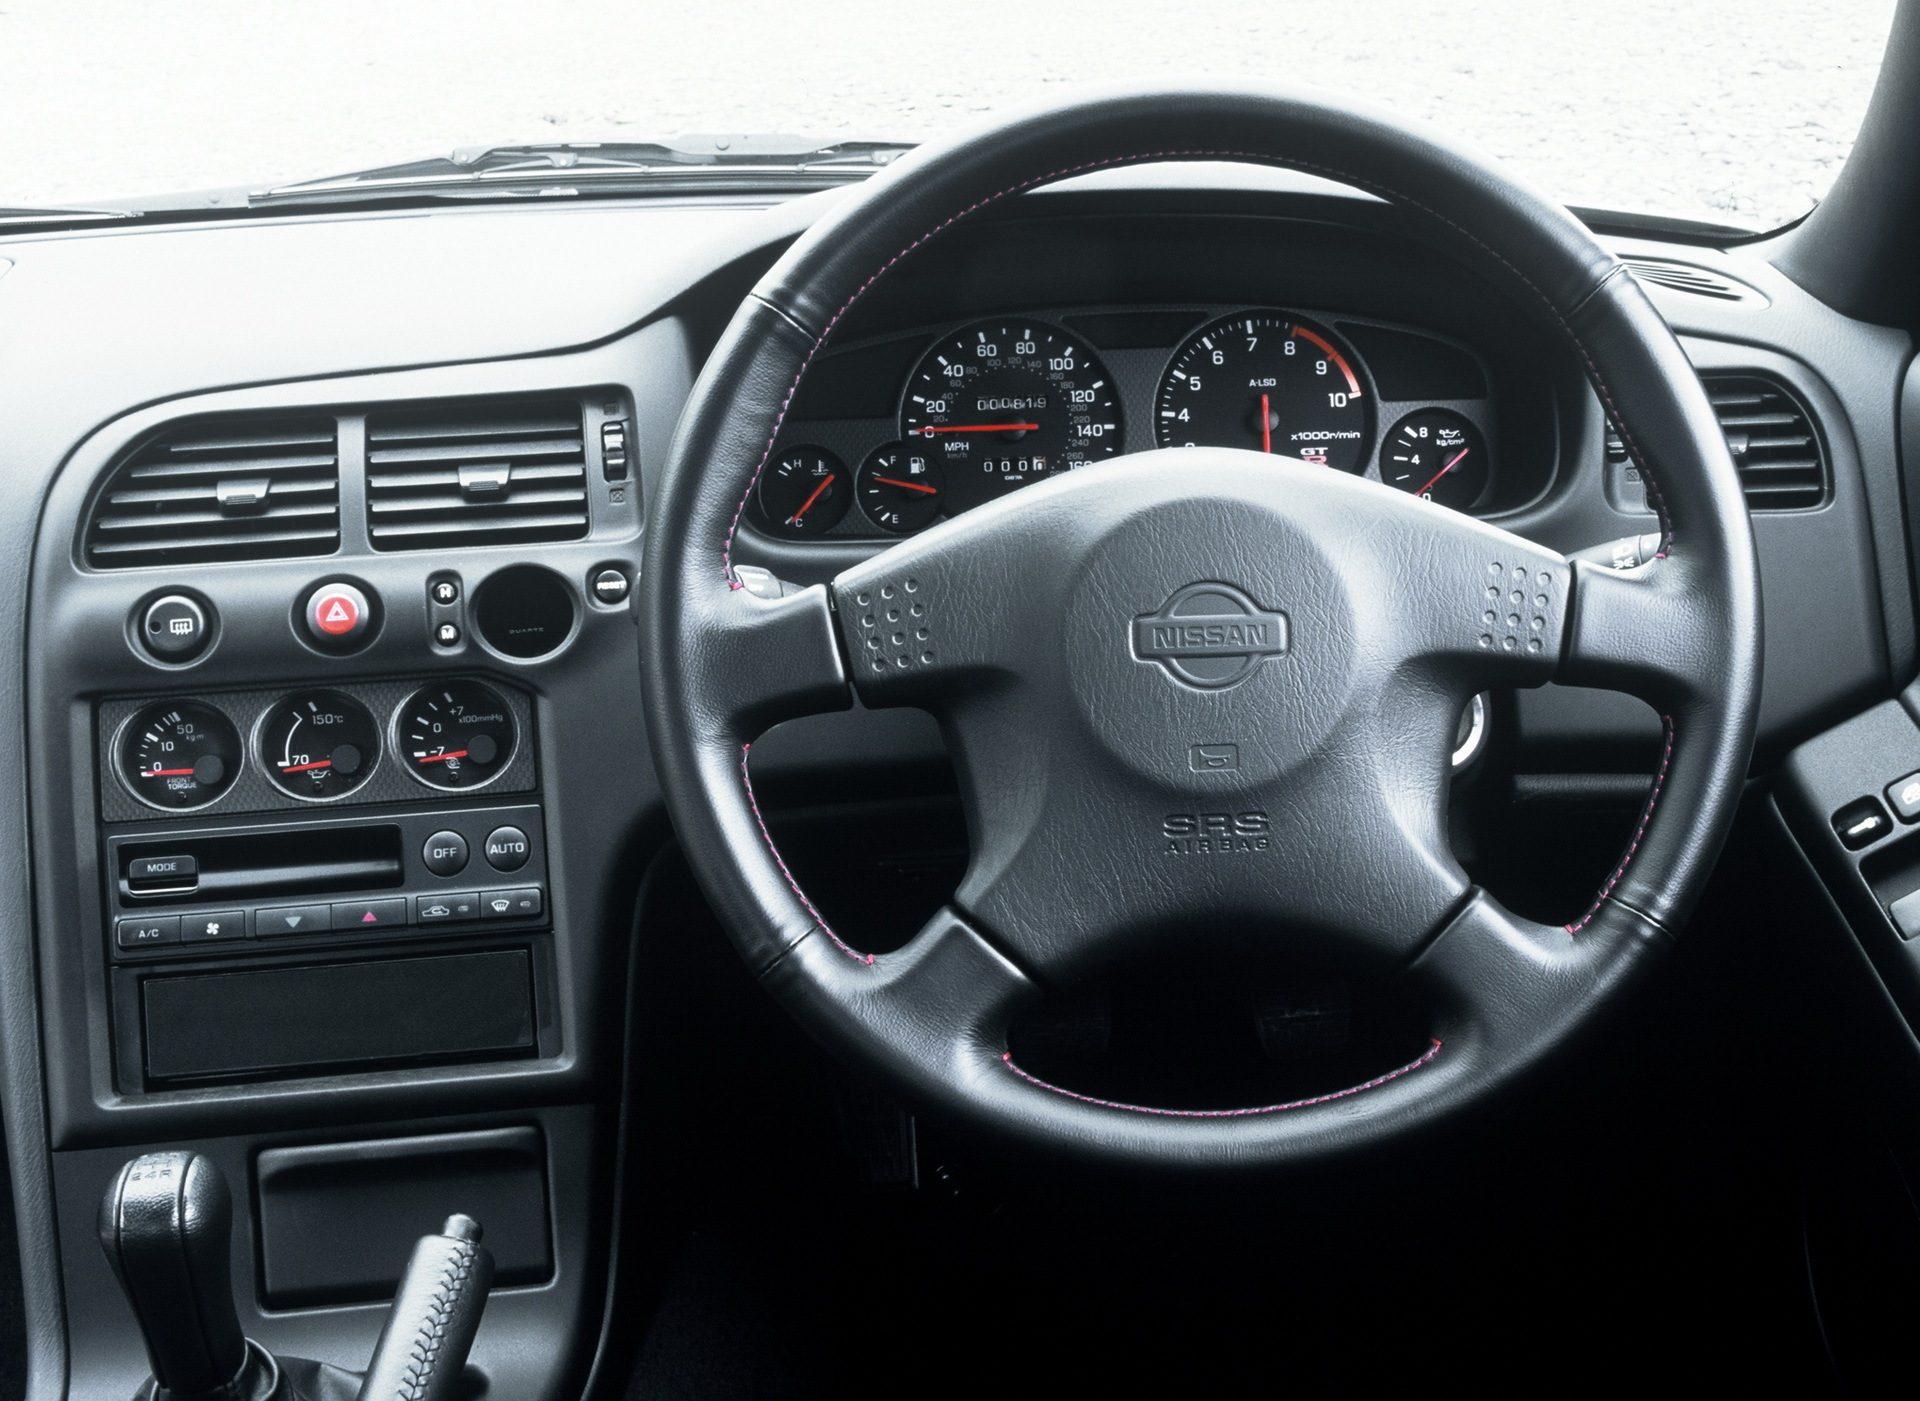 1995 Nissan skyline R33 interior